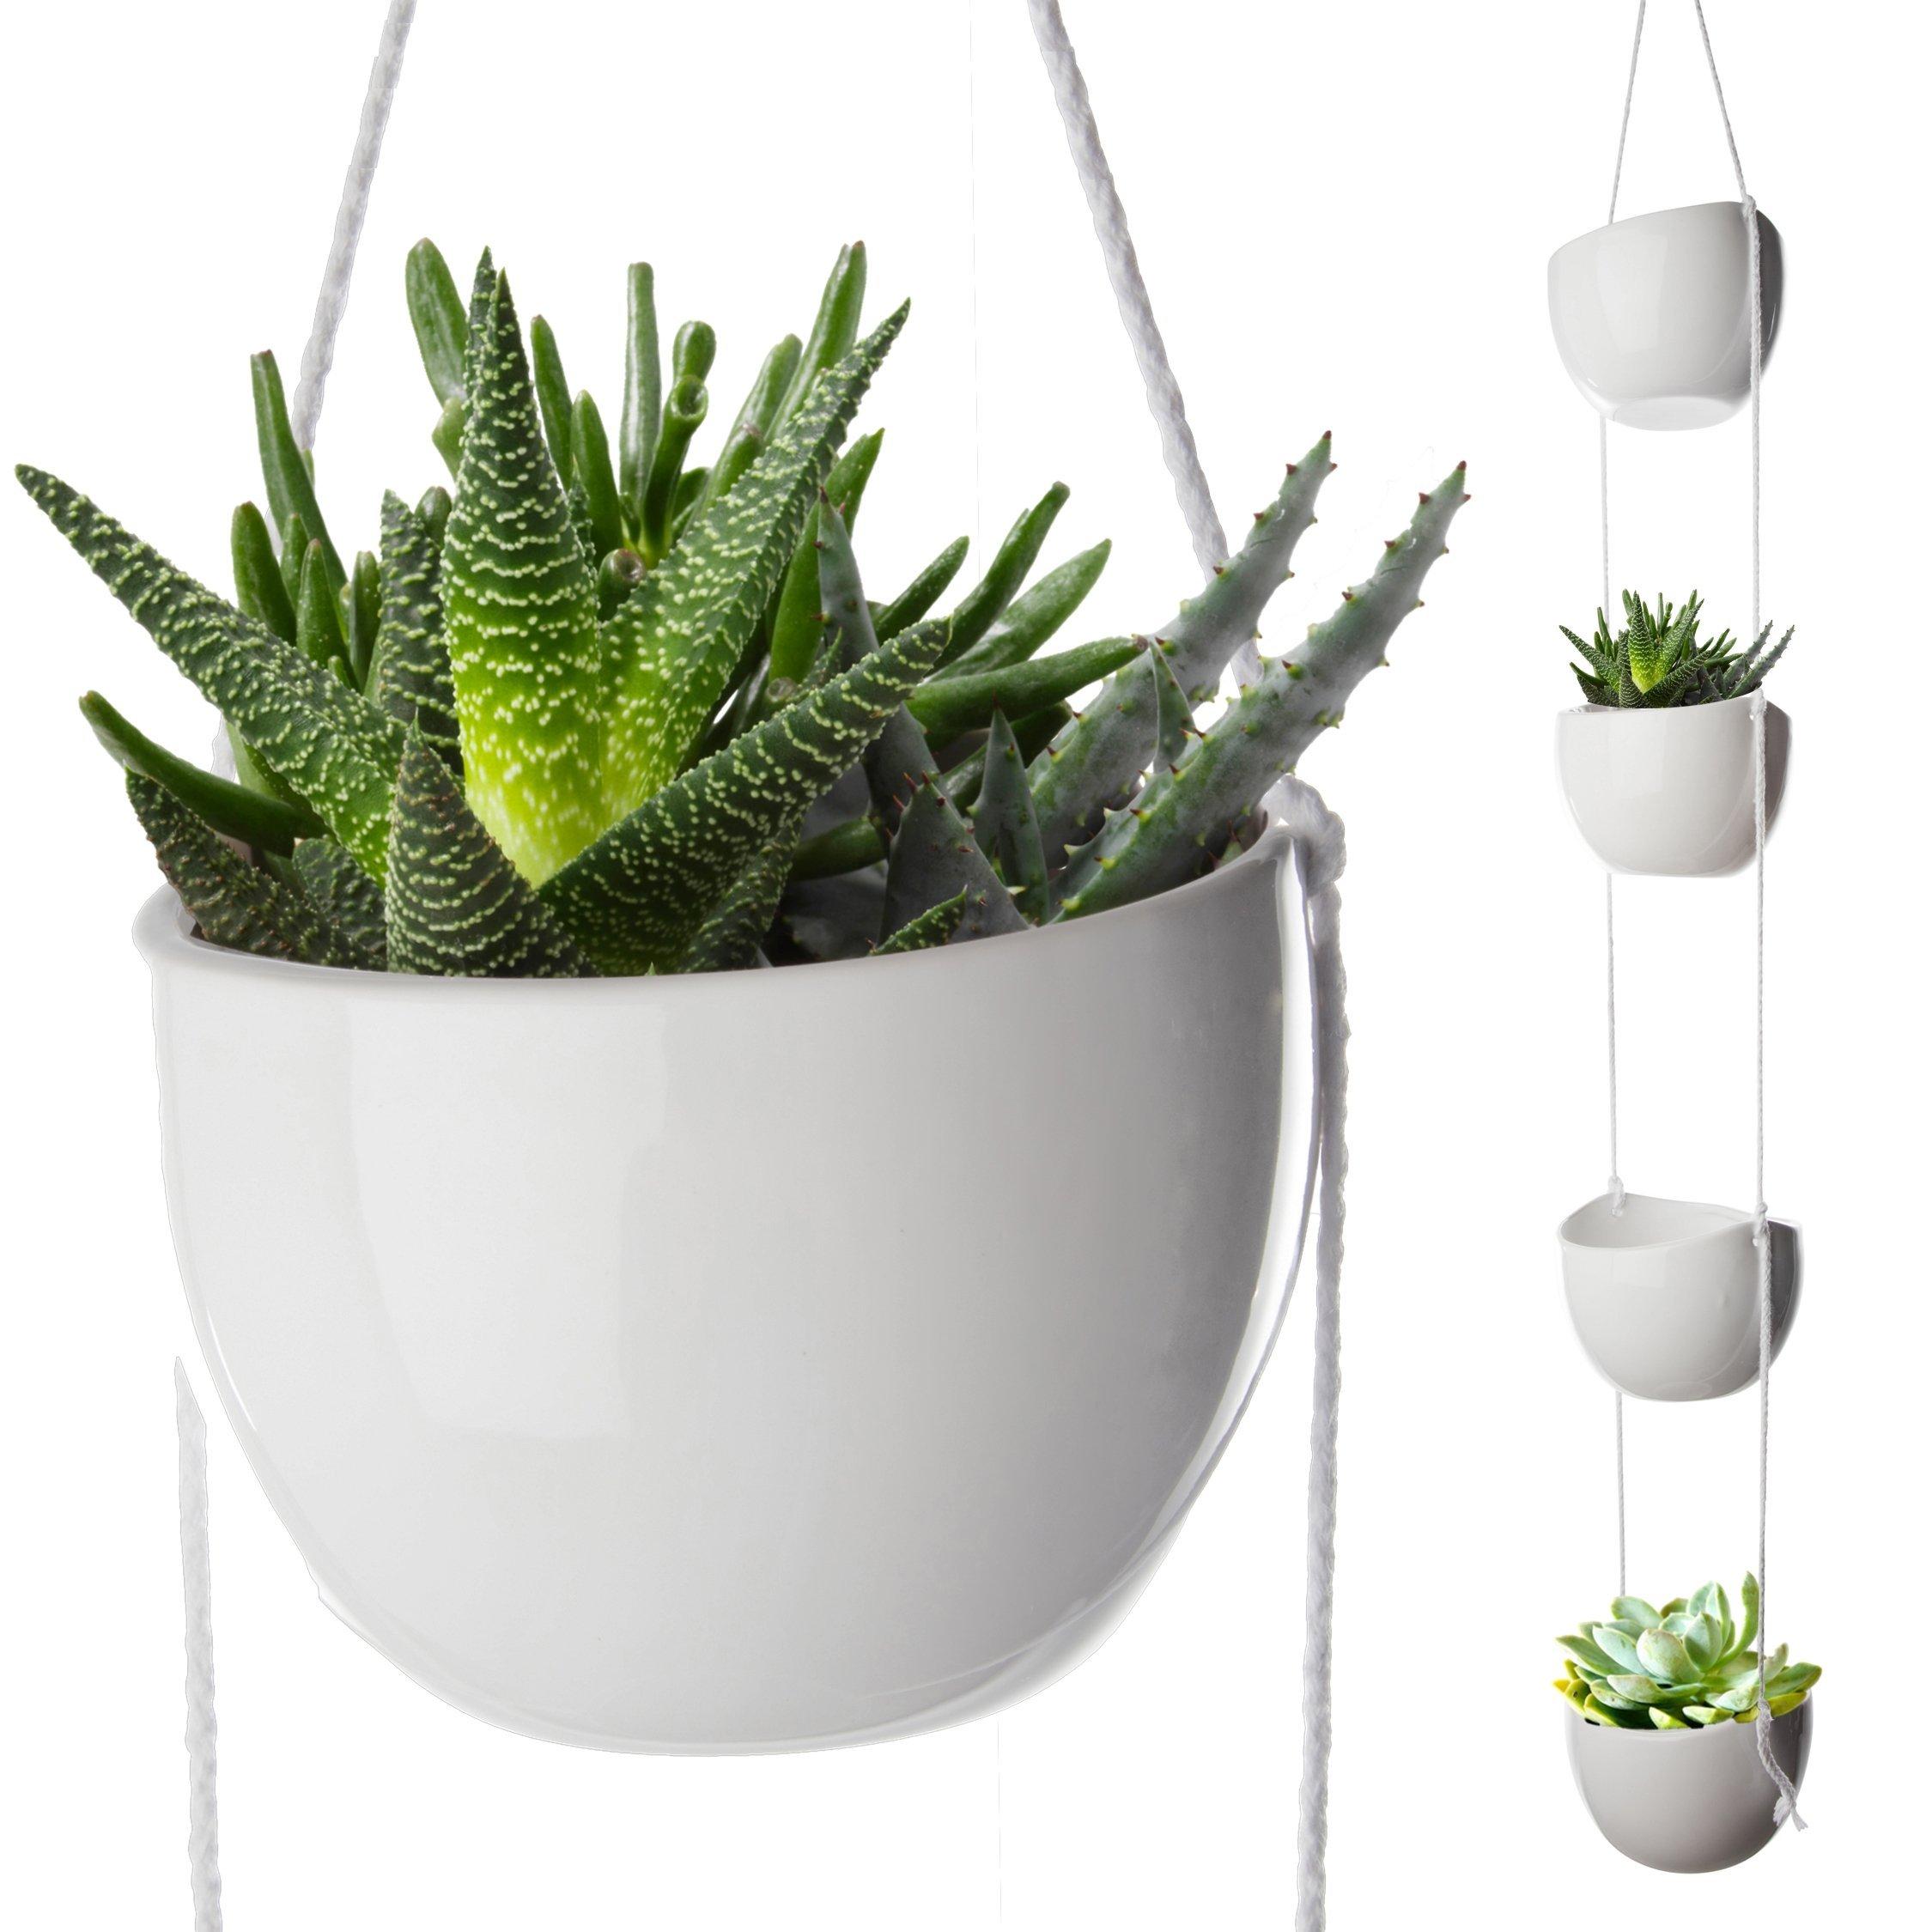 4 Piece Modern Ceramic Hanging Planters For Indoor Plants, Outdoor Planter,  Succulent Plants Pots